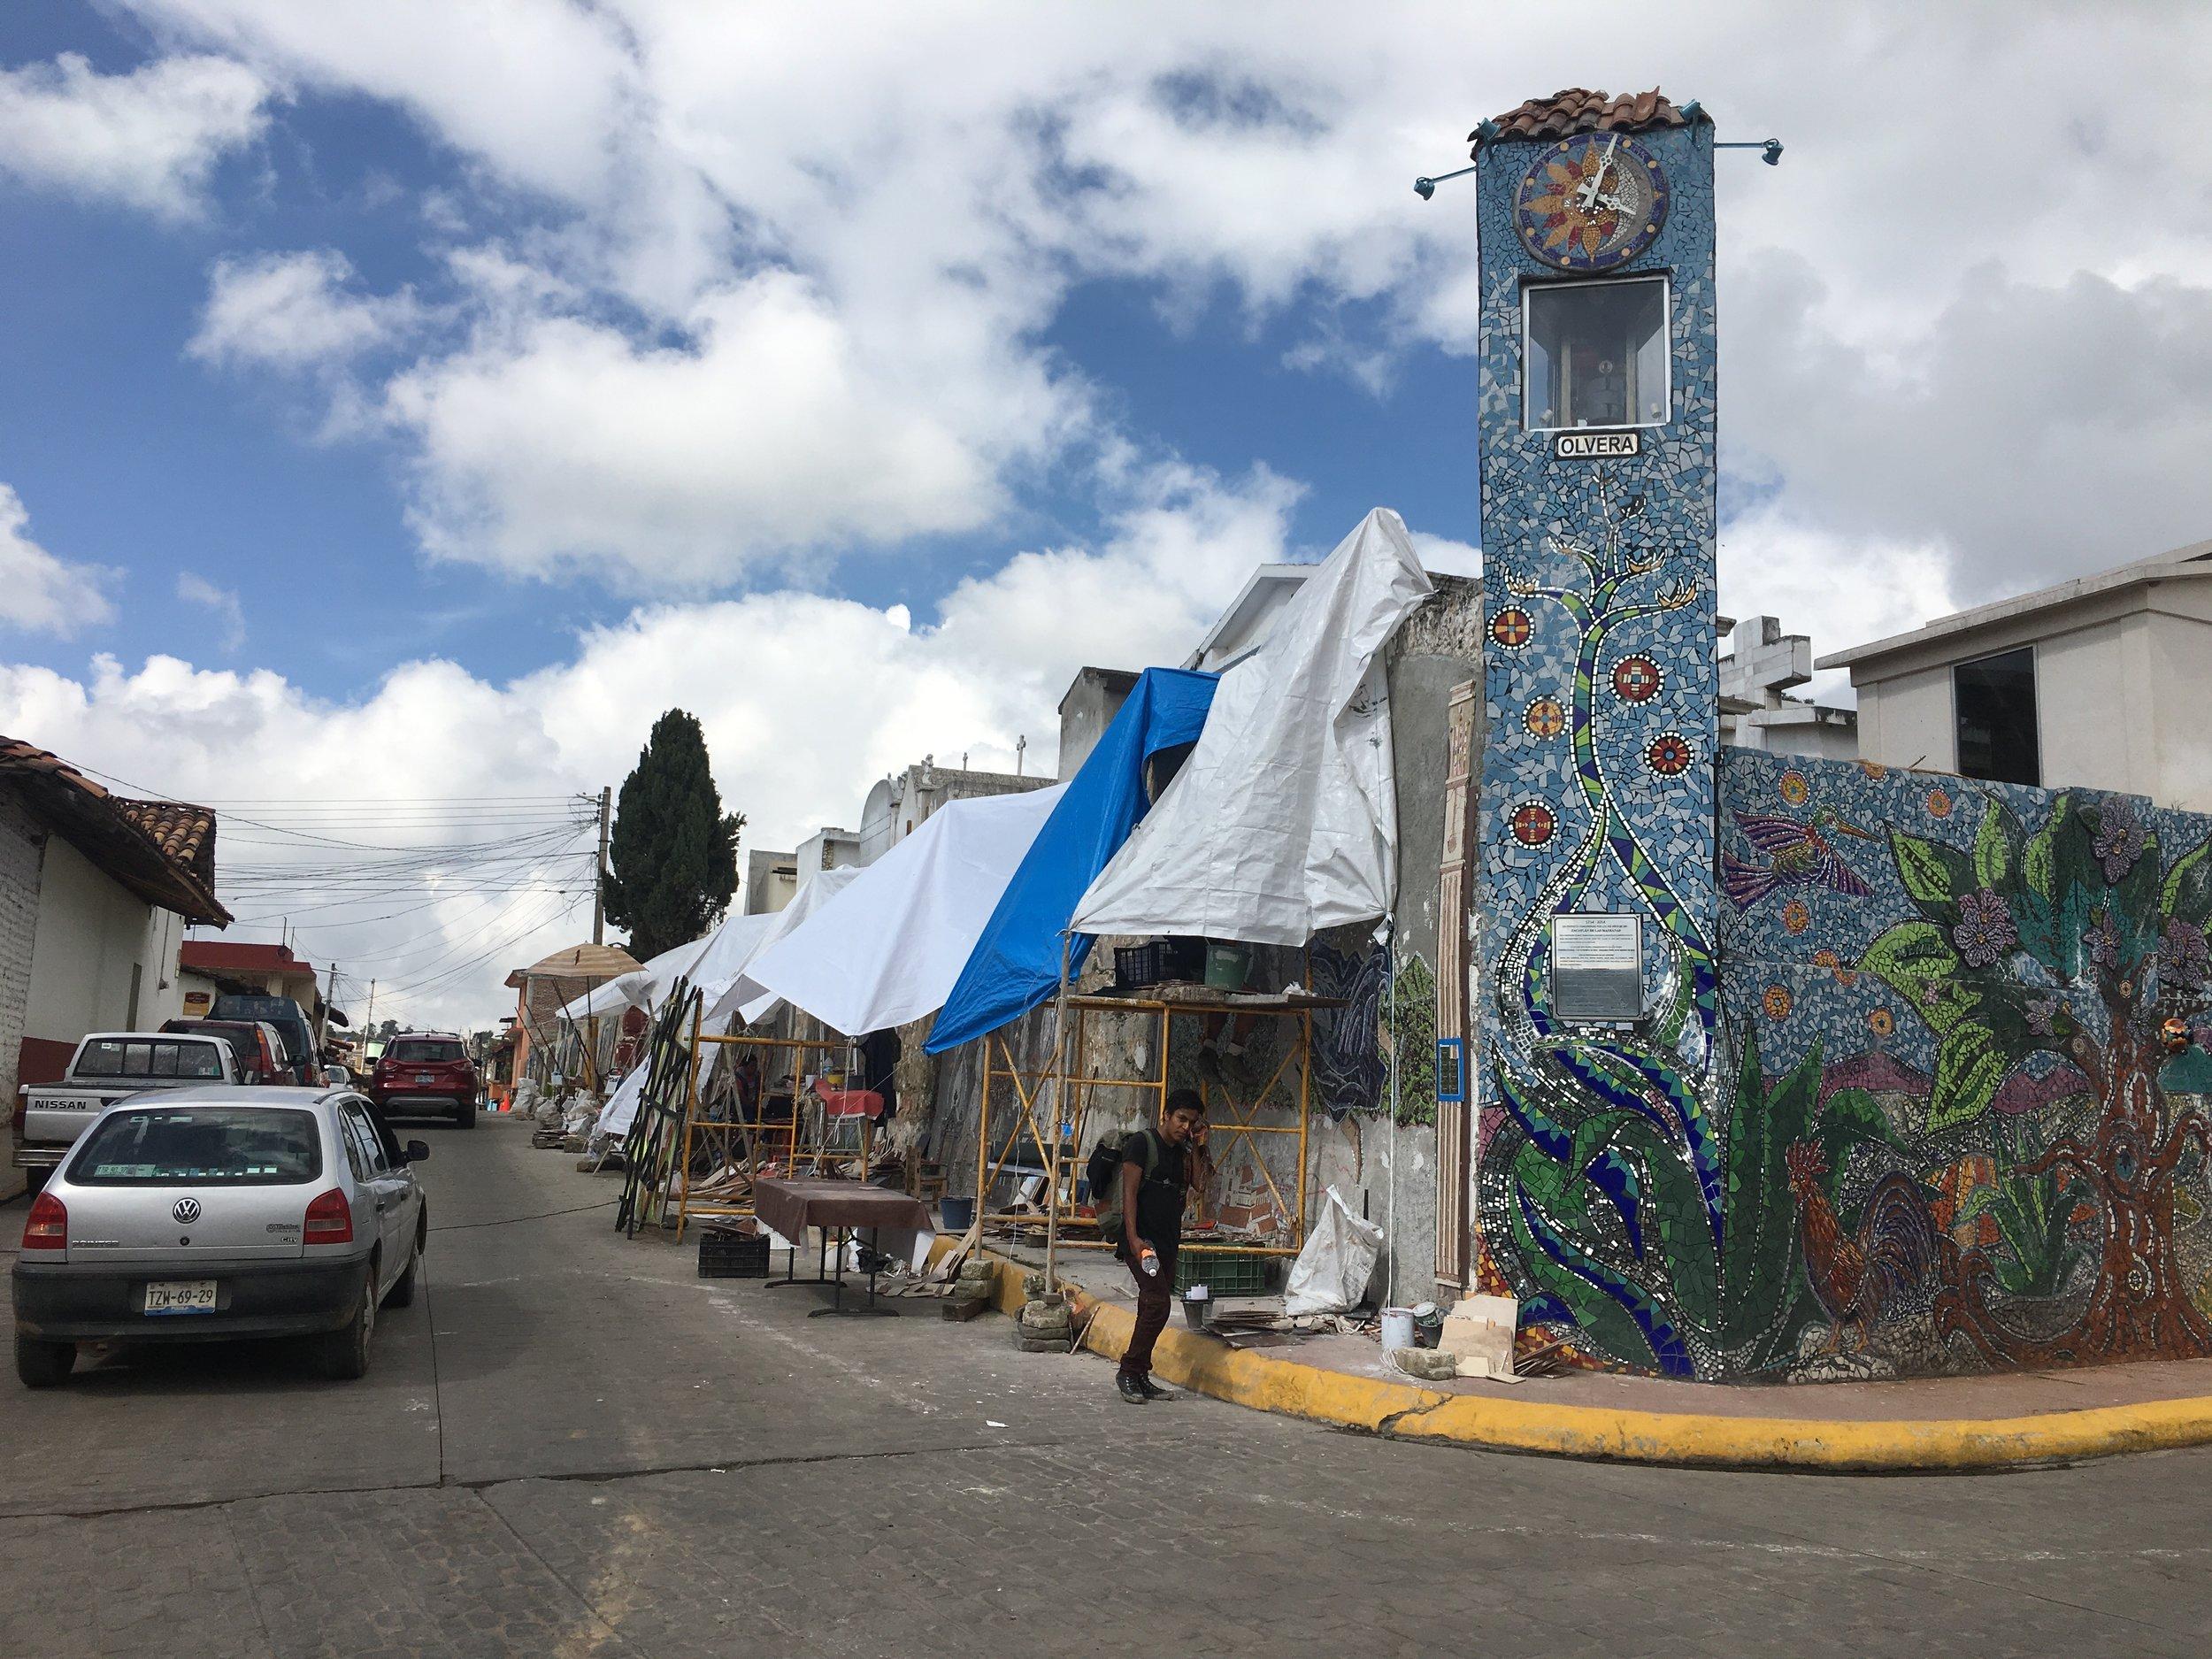 Zacatlan De Las Manzanas - Commission: Trish Metzner Mosaic Installation Date 2014-2017